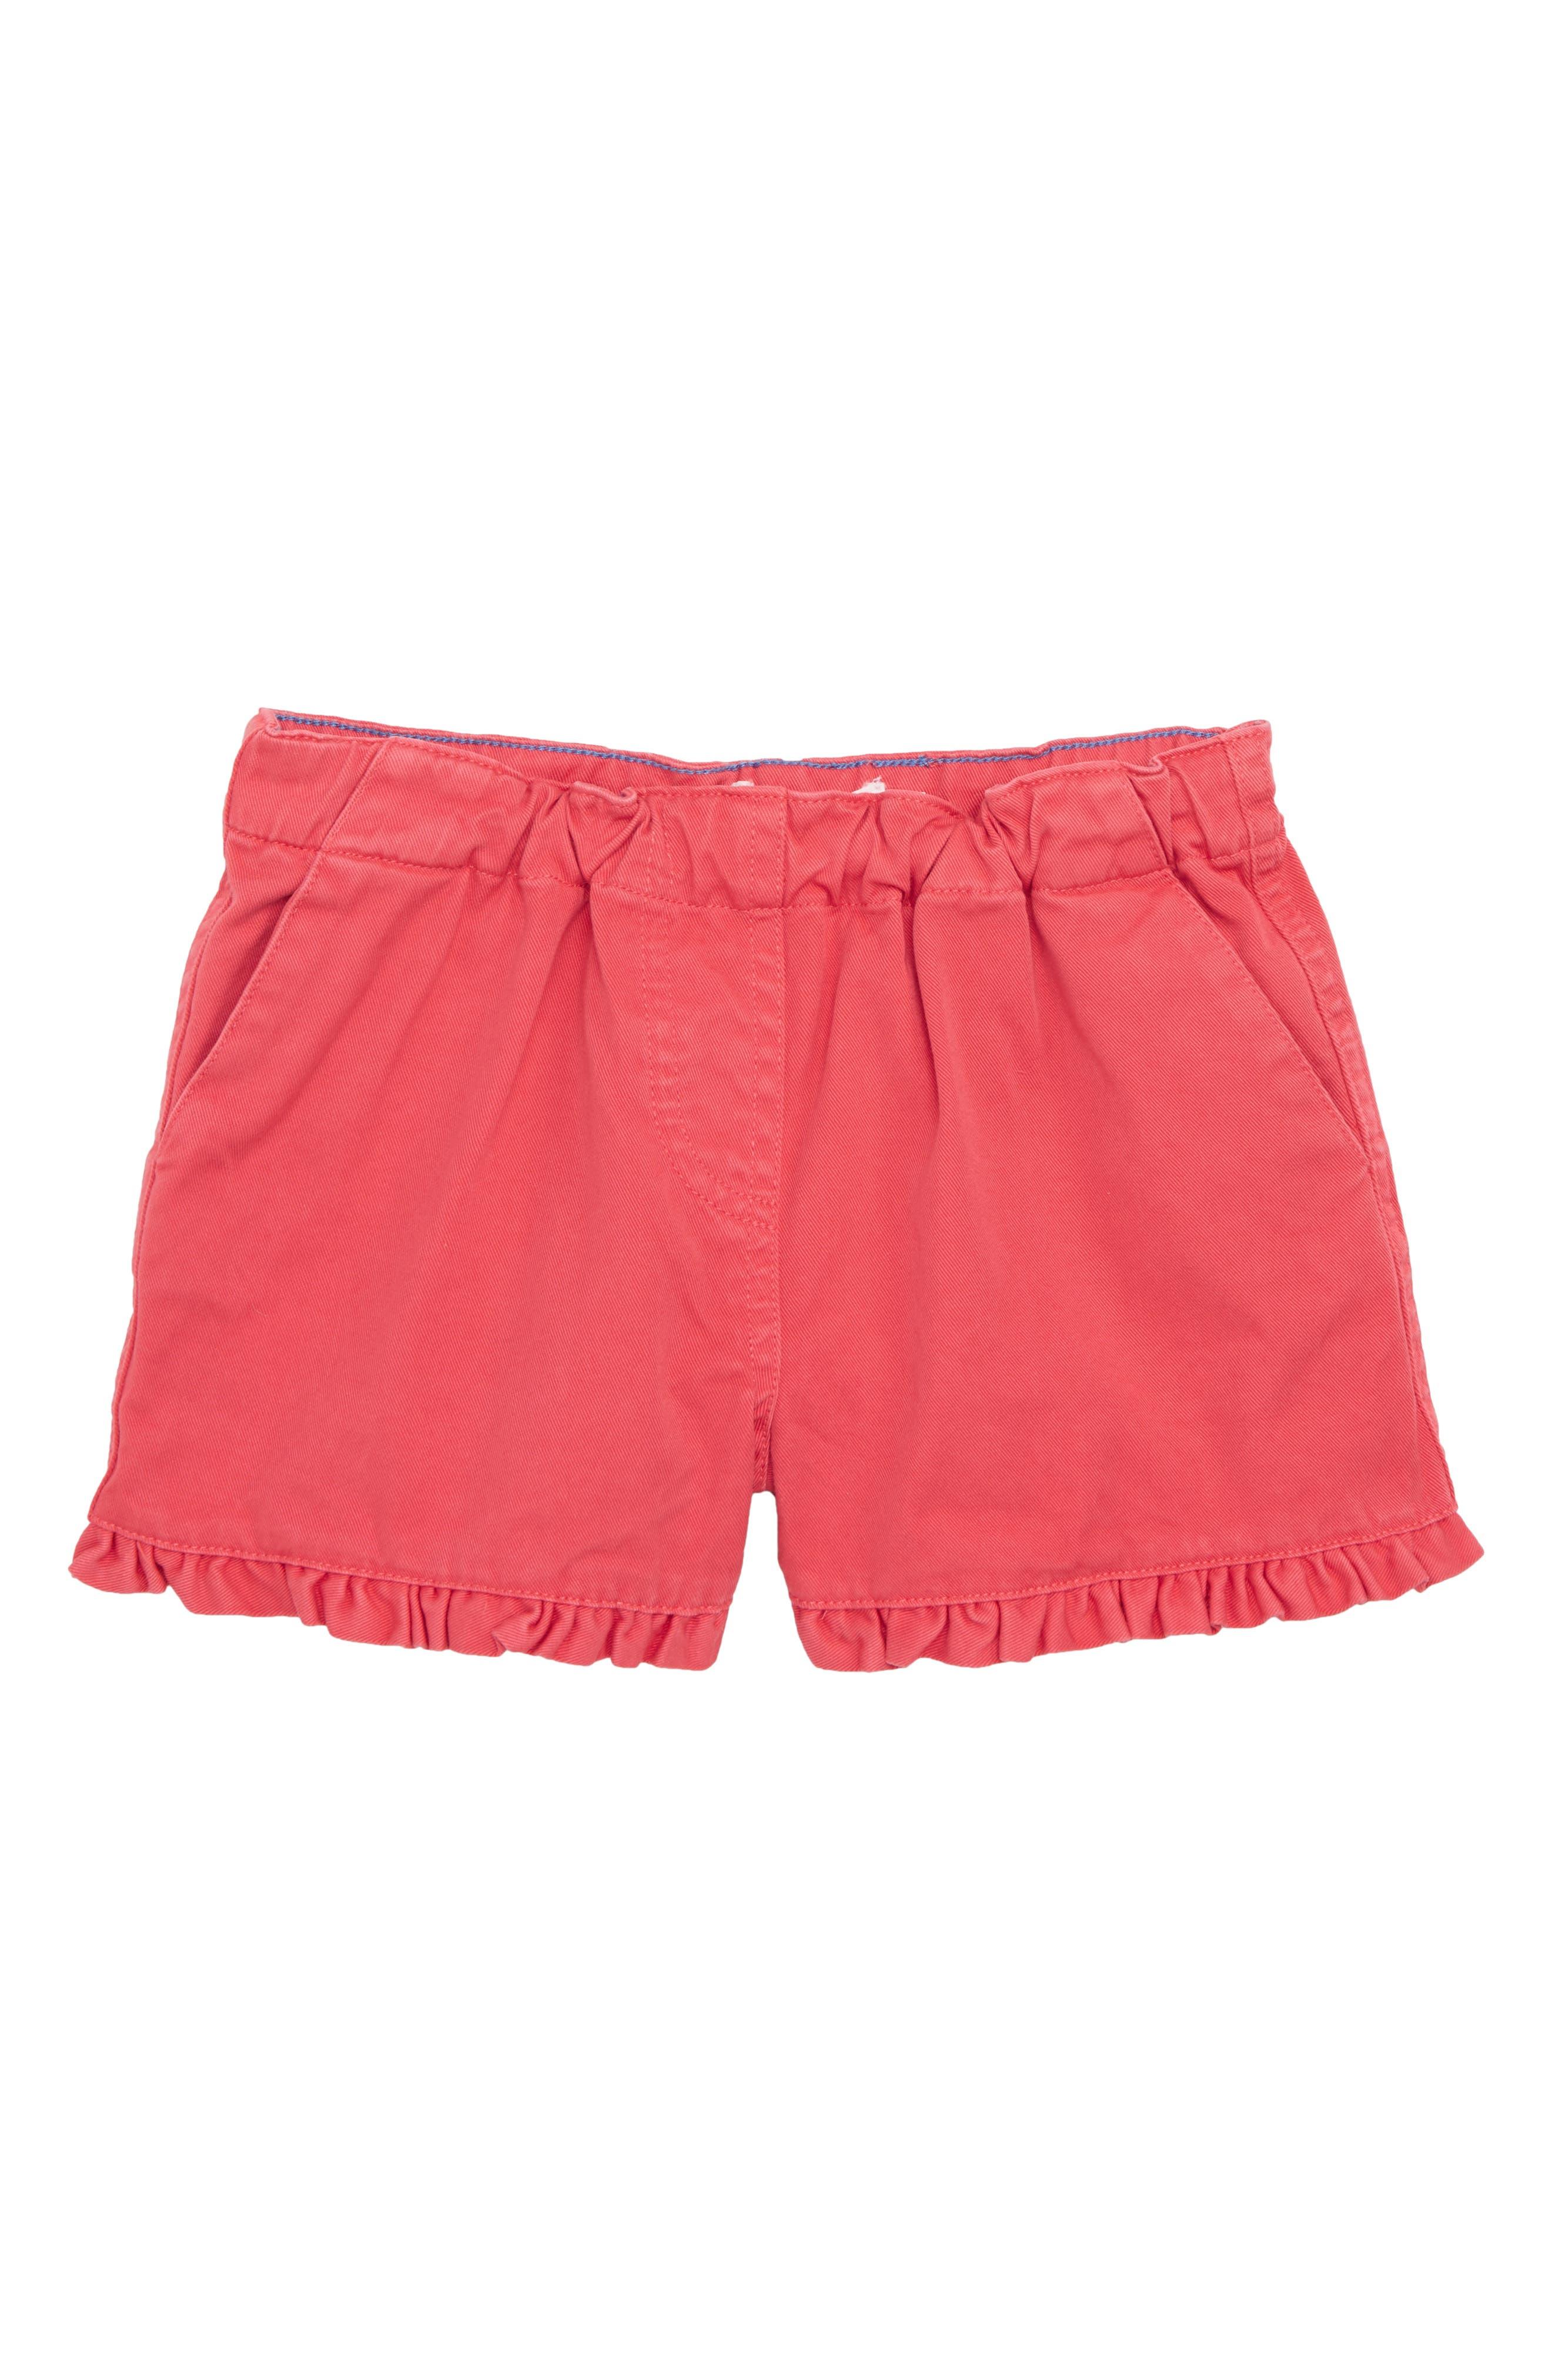 Frill Detail Shorts,                         Main,                         color, Strawberry Split Pin